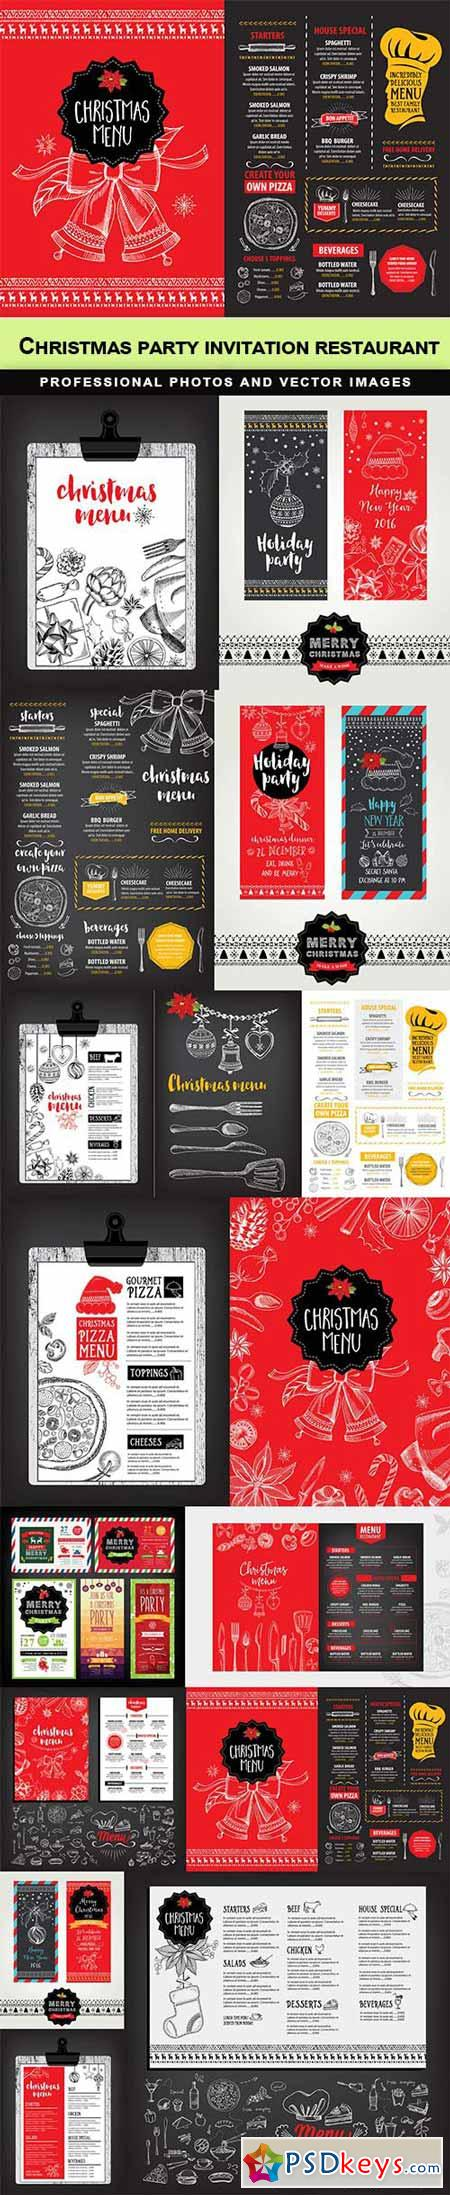 Christmas party invitation restaurant - 15 EPS